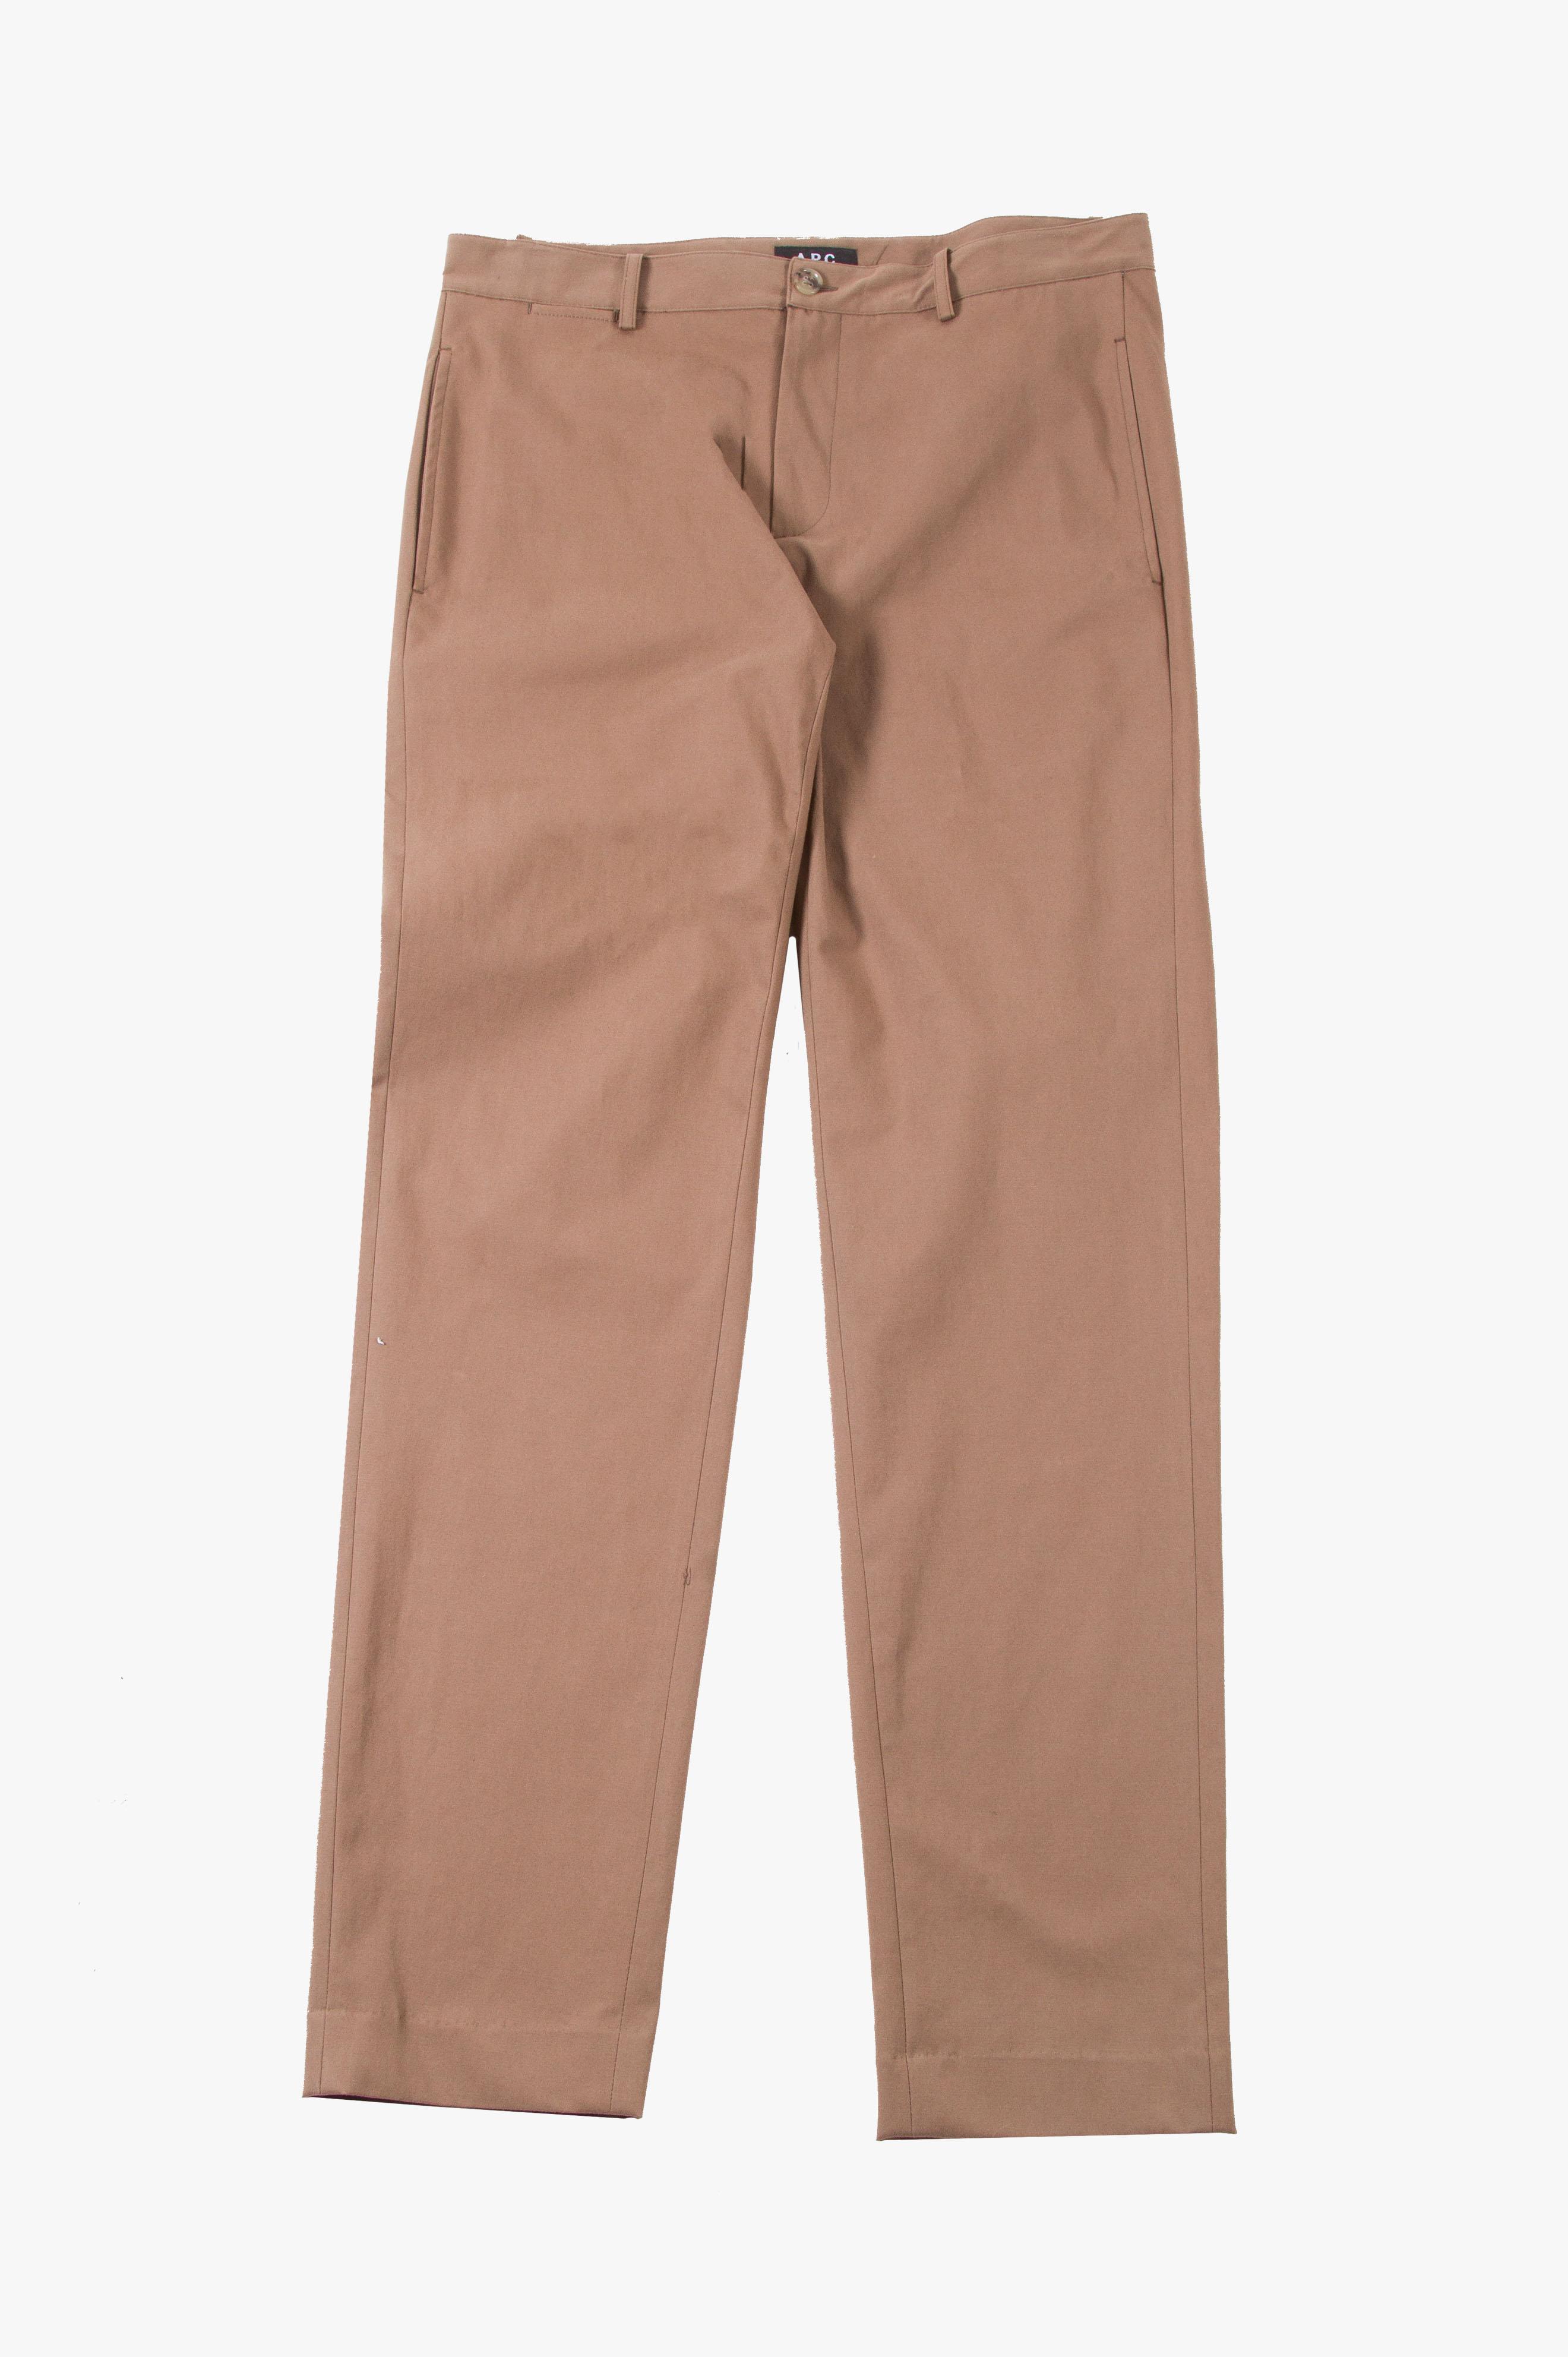 Quake Trousers Tobacco